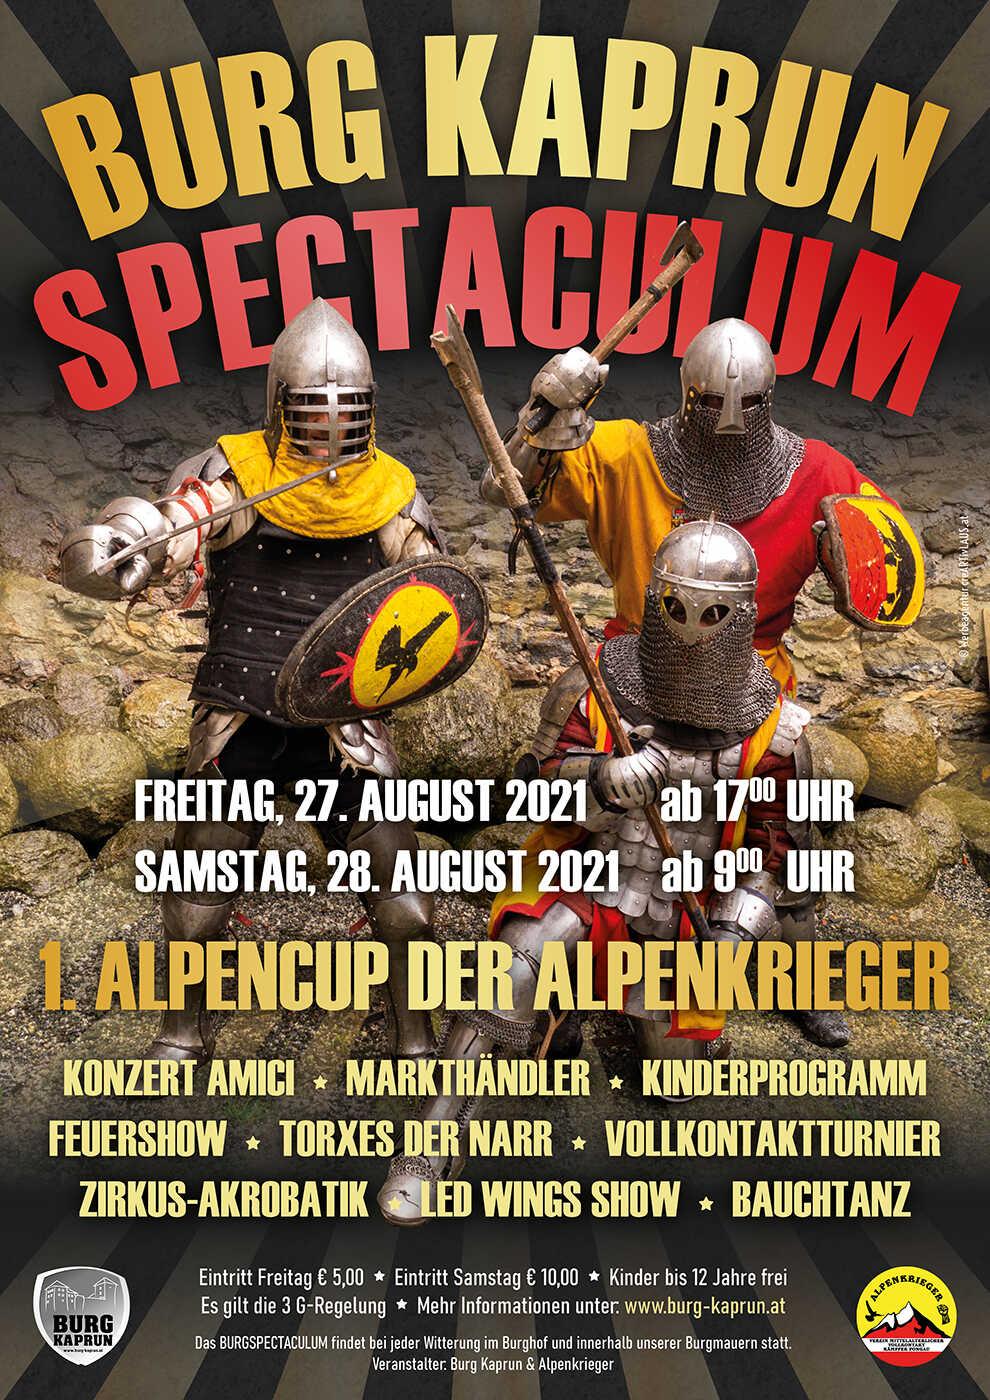 Burg Kaprun – Spectaculum